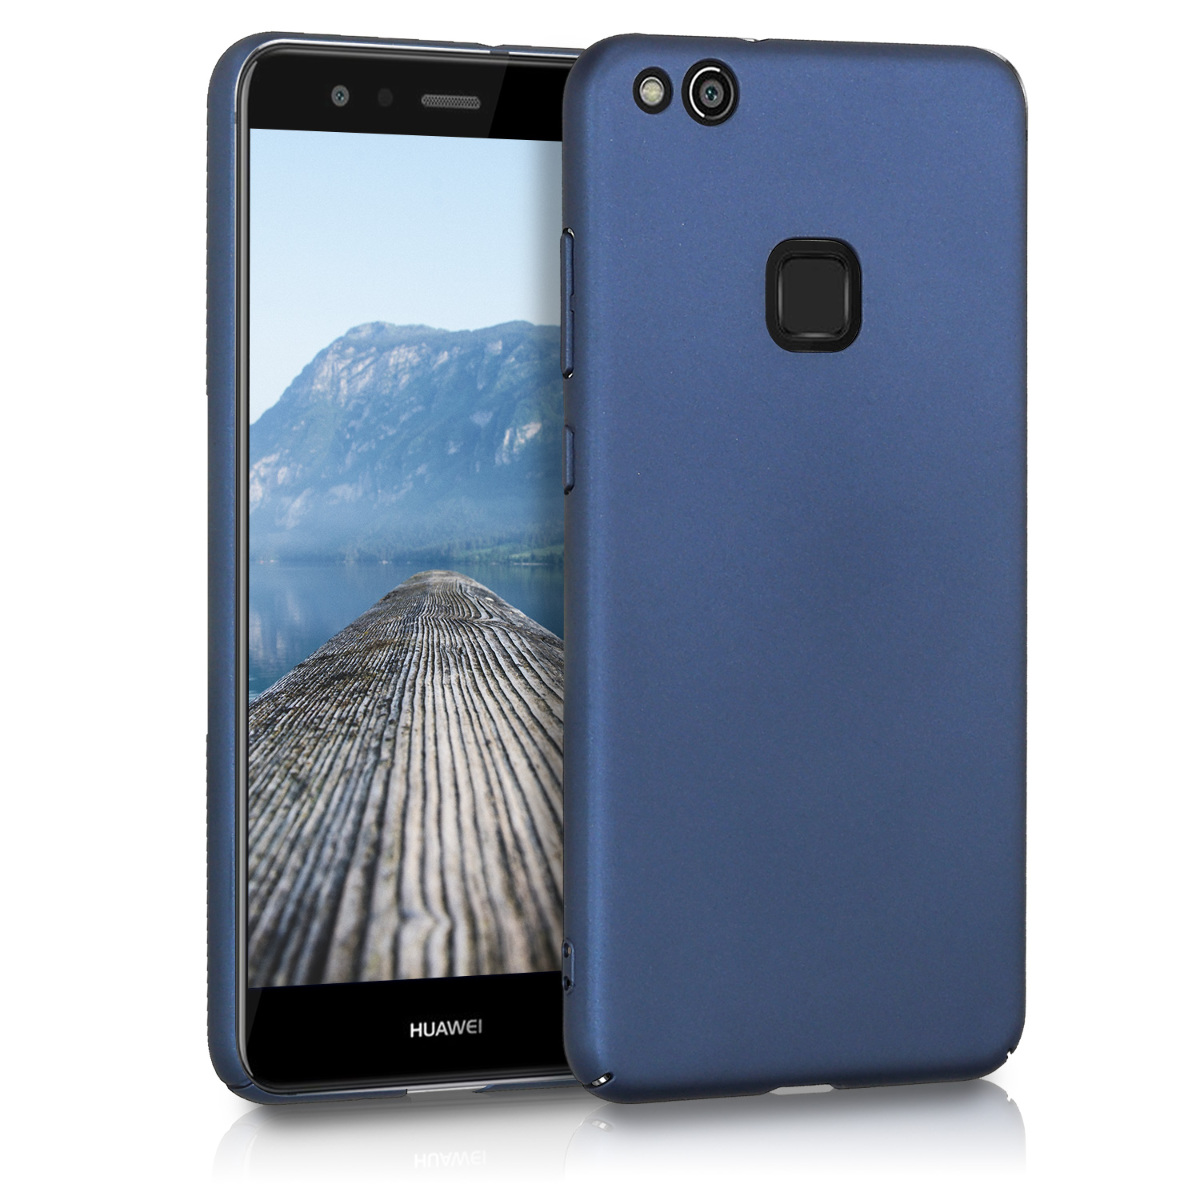 KW Slim Anti-Slip Cover - Σκληρή Θήκη Καουτσούκ Huawei P10 Lite - Σκούρο μπλε μεταλλικό (43232.53)